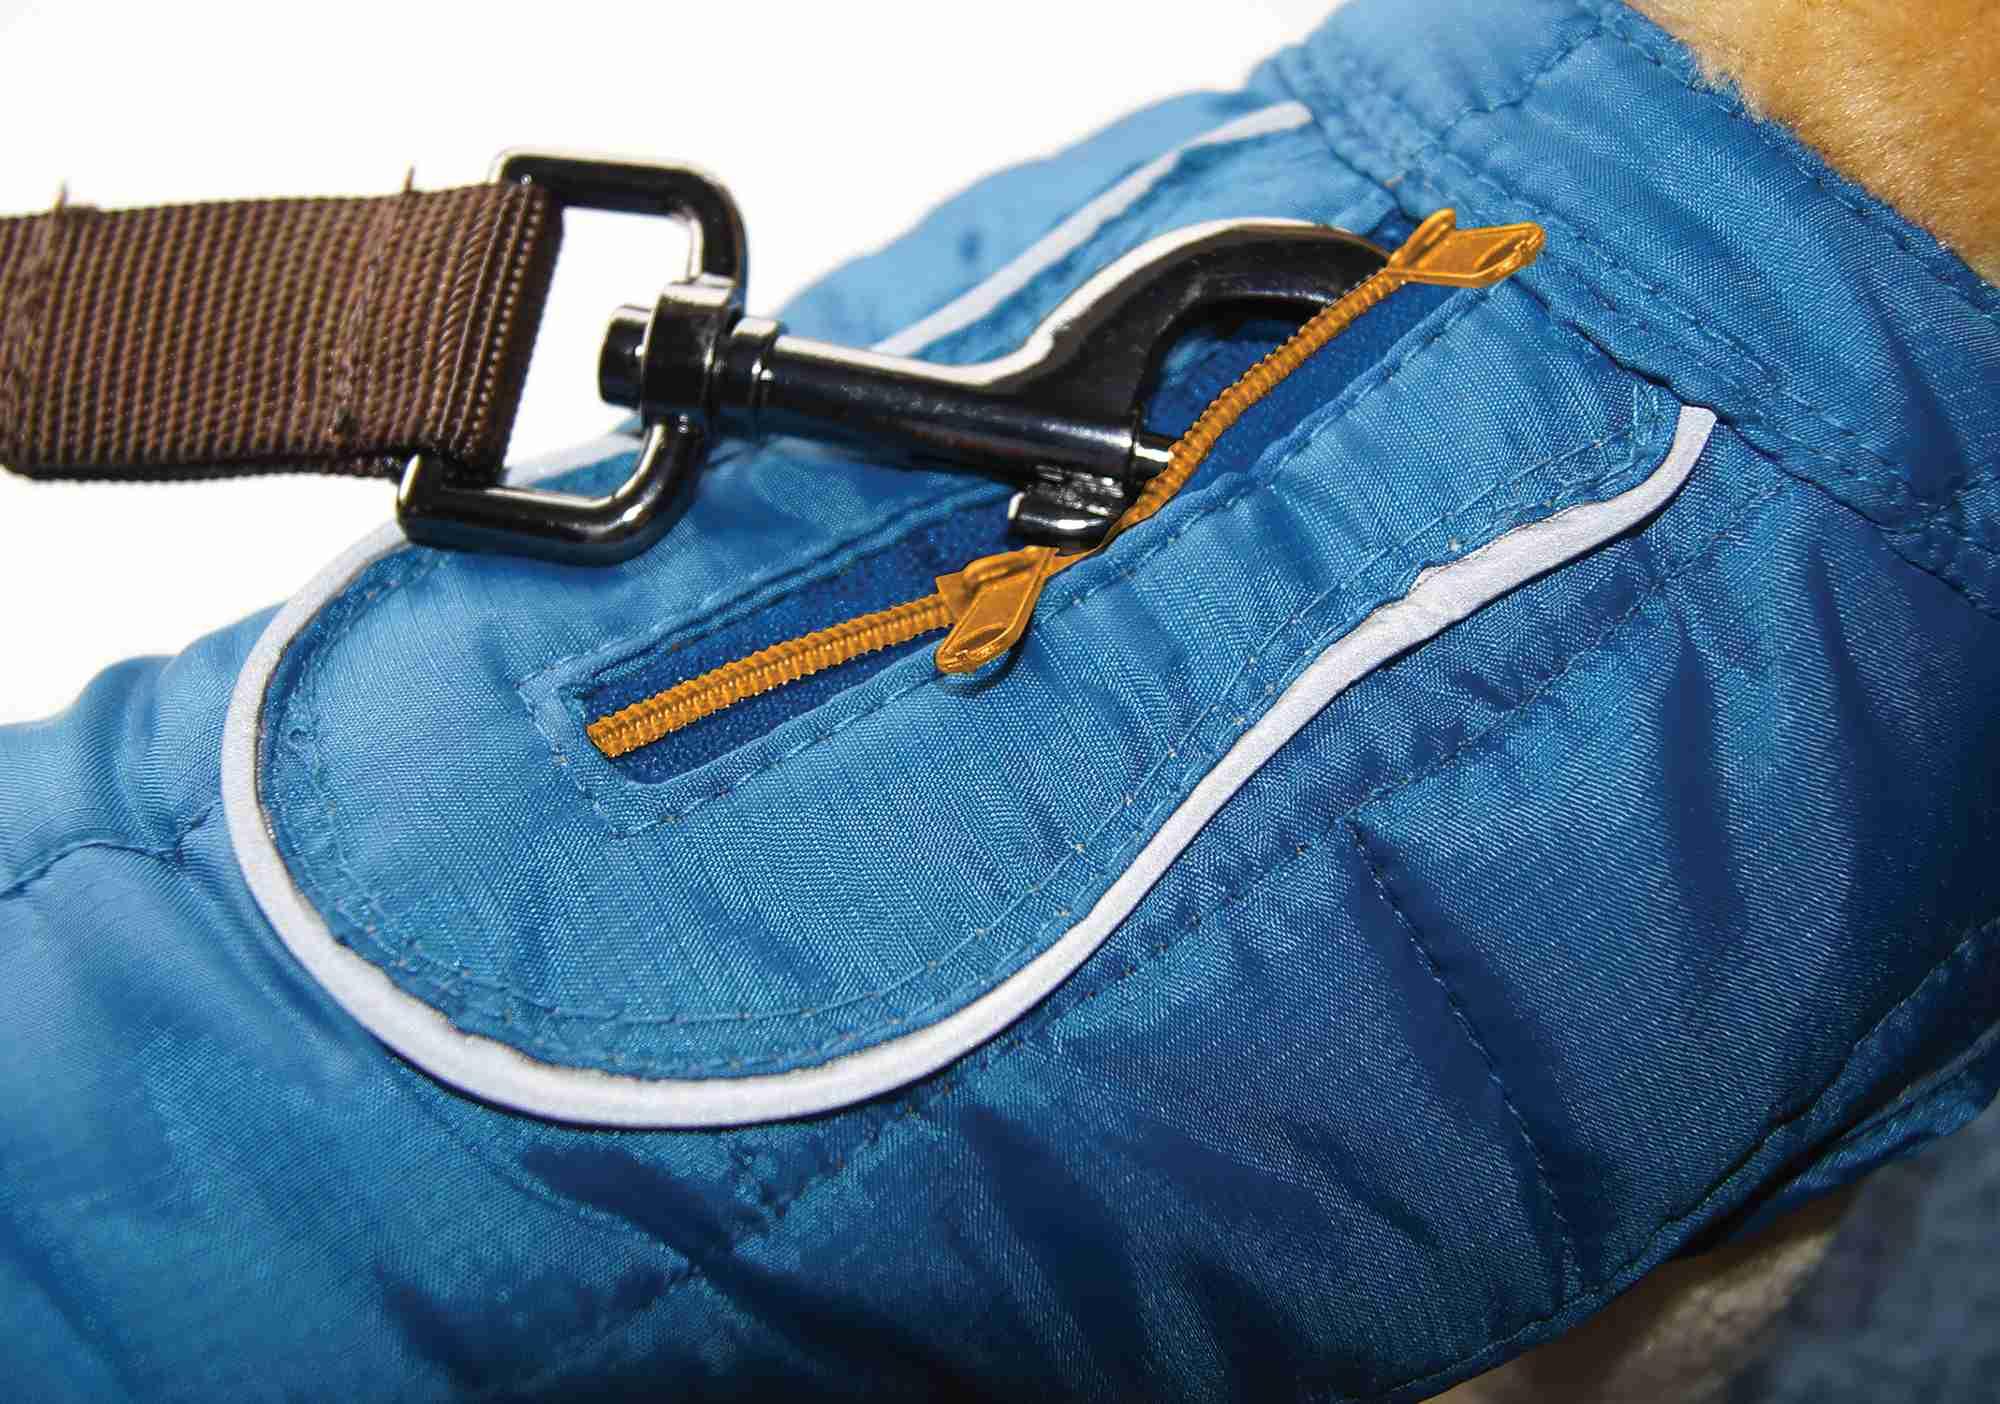 Dog winter coat - Kurgo Loft Dog Coat opens to hook leash to harness or collar